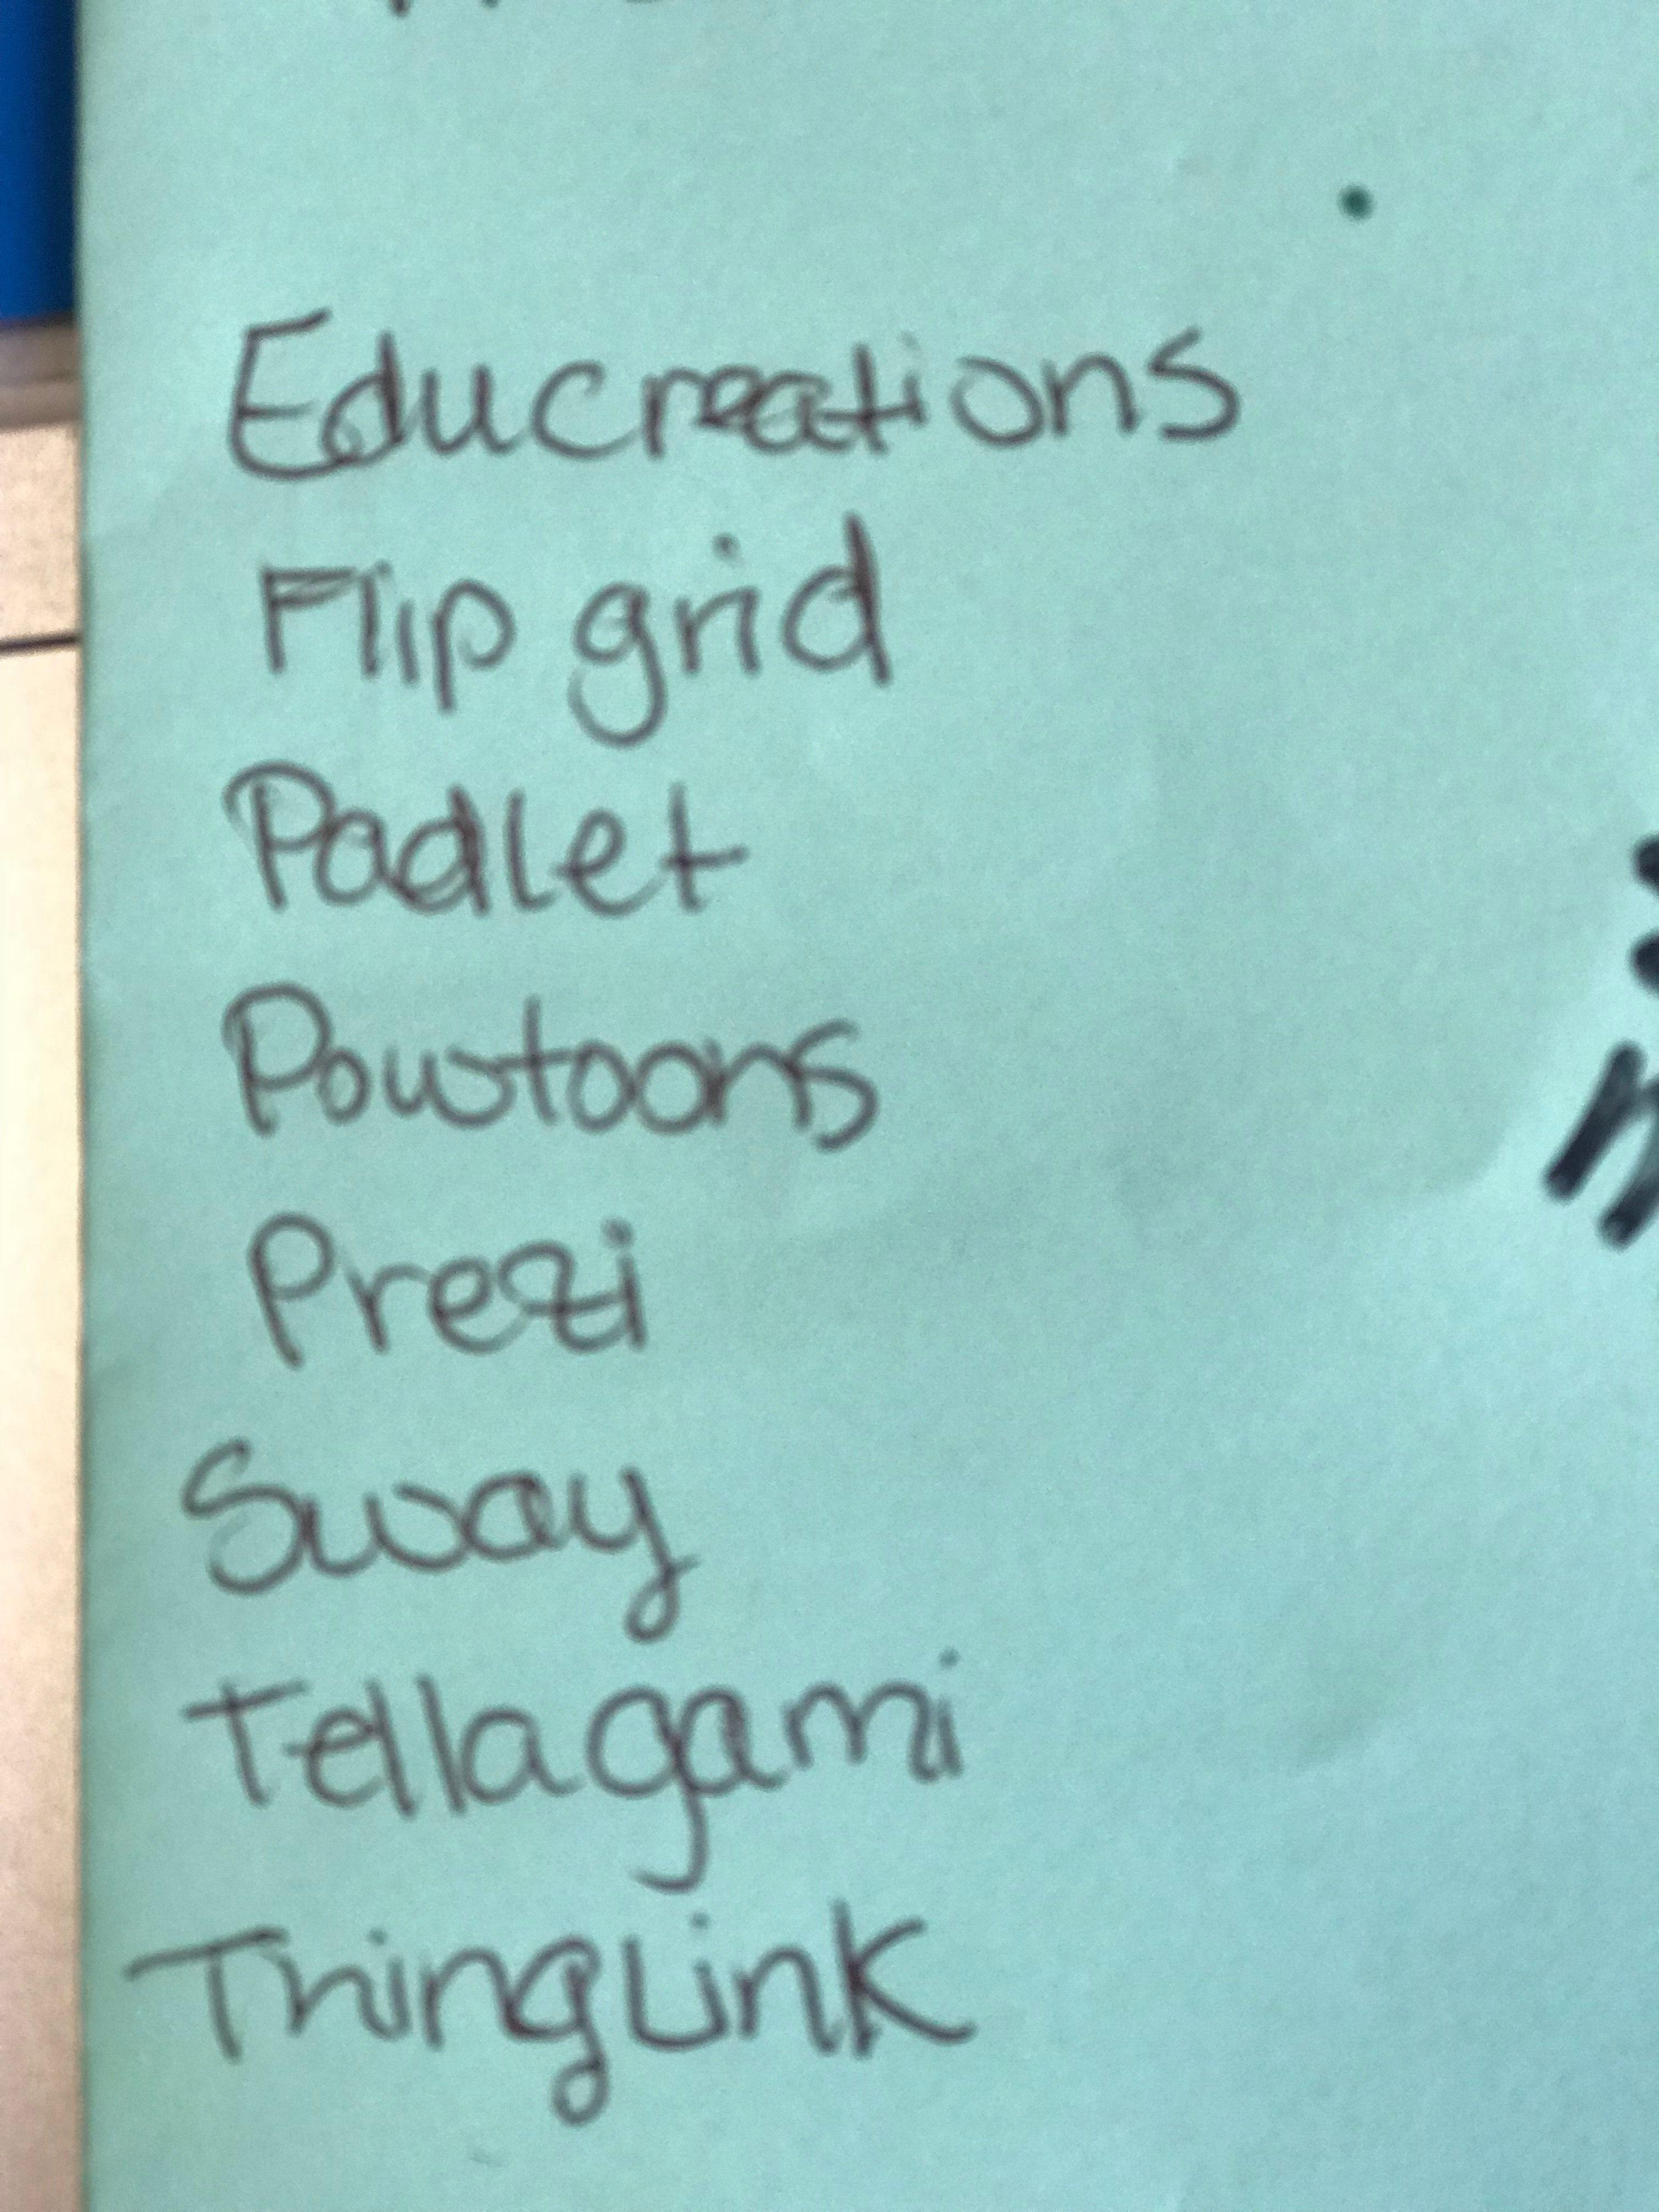 Pin by Darcee Maddy on 6th grade math | Pinterest | Math, Teaching ...